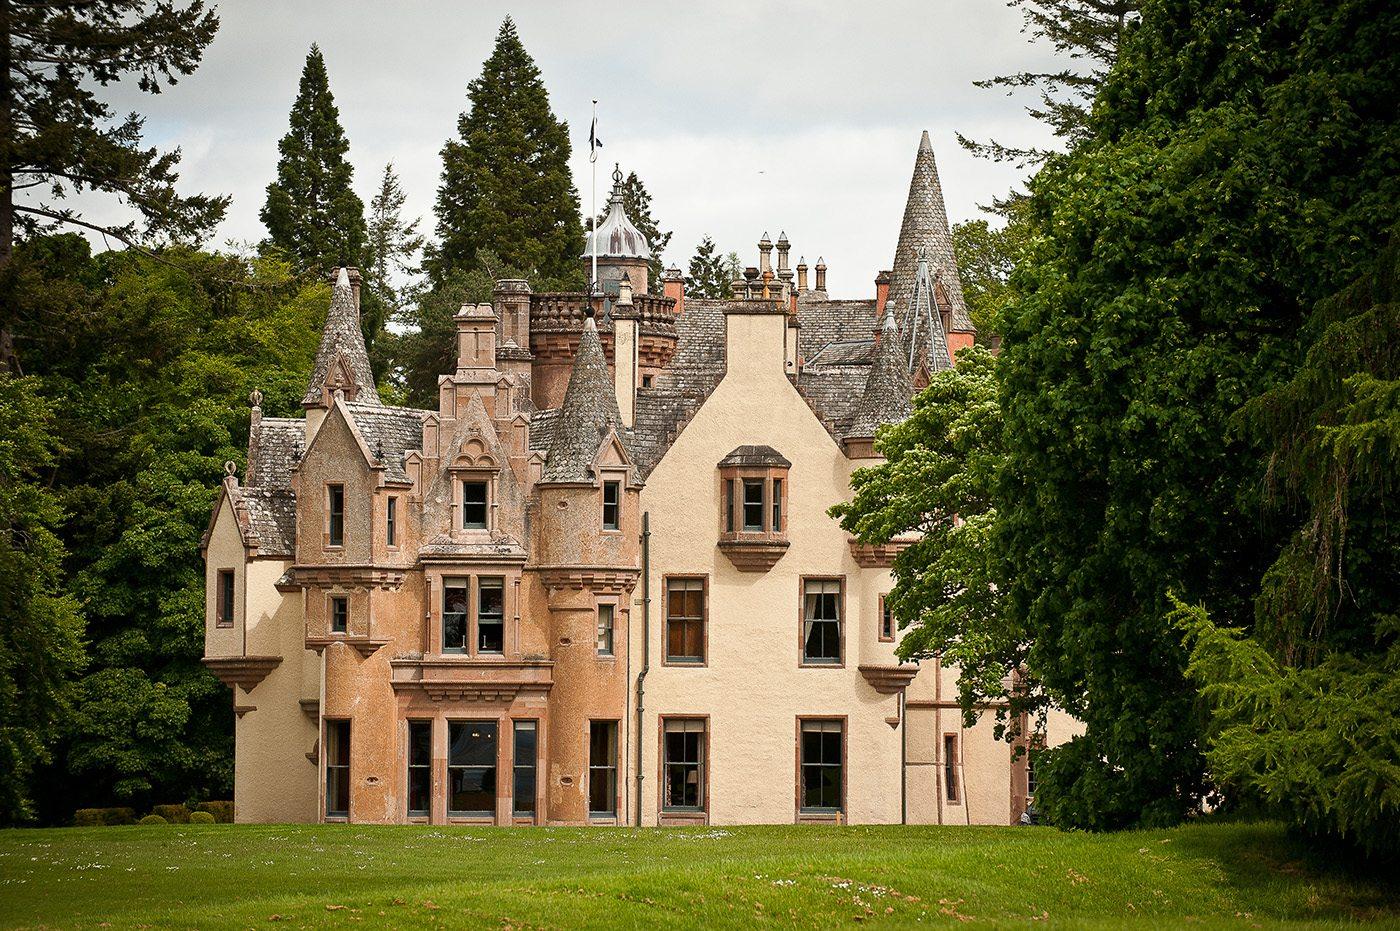 castle loch ness scotland